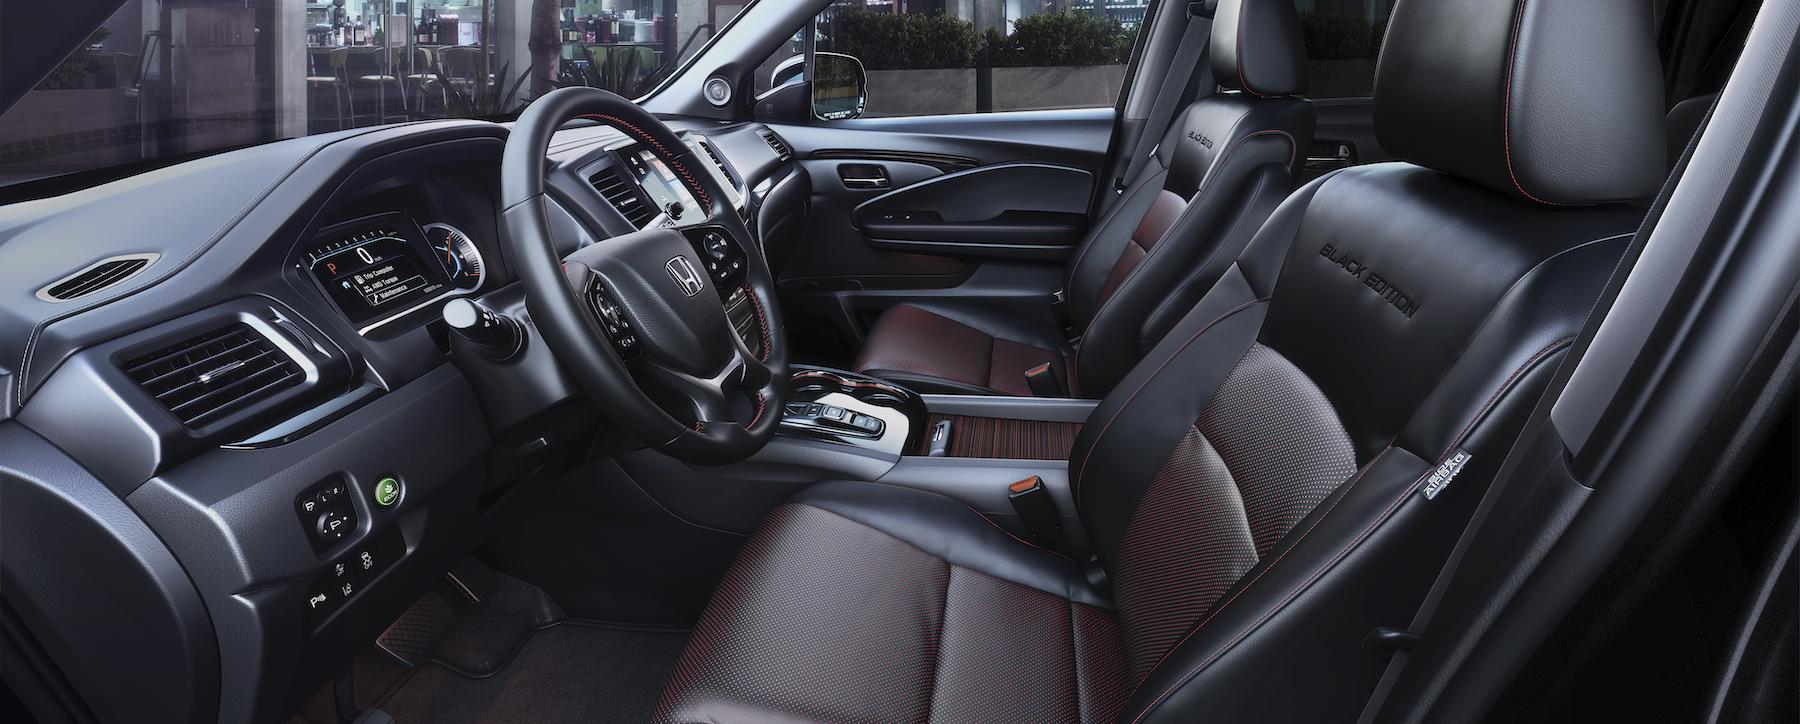 Model Features of the 2020 Honda Pilot at Boch Honda in Norwood | 2020 Honda Pilot interior